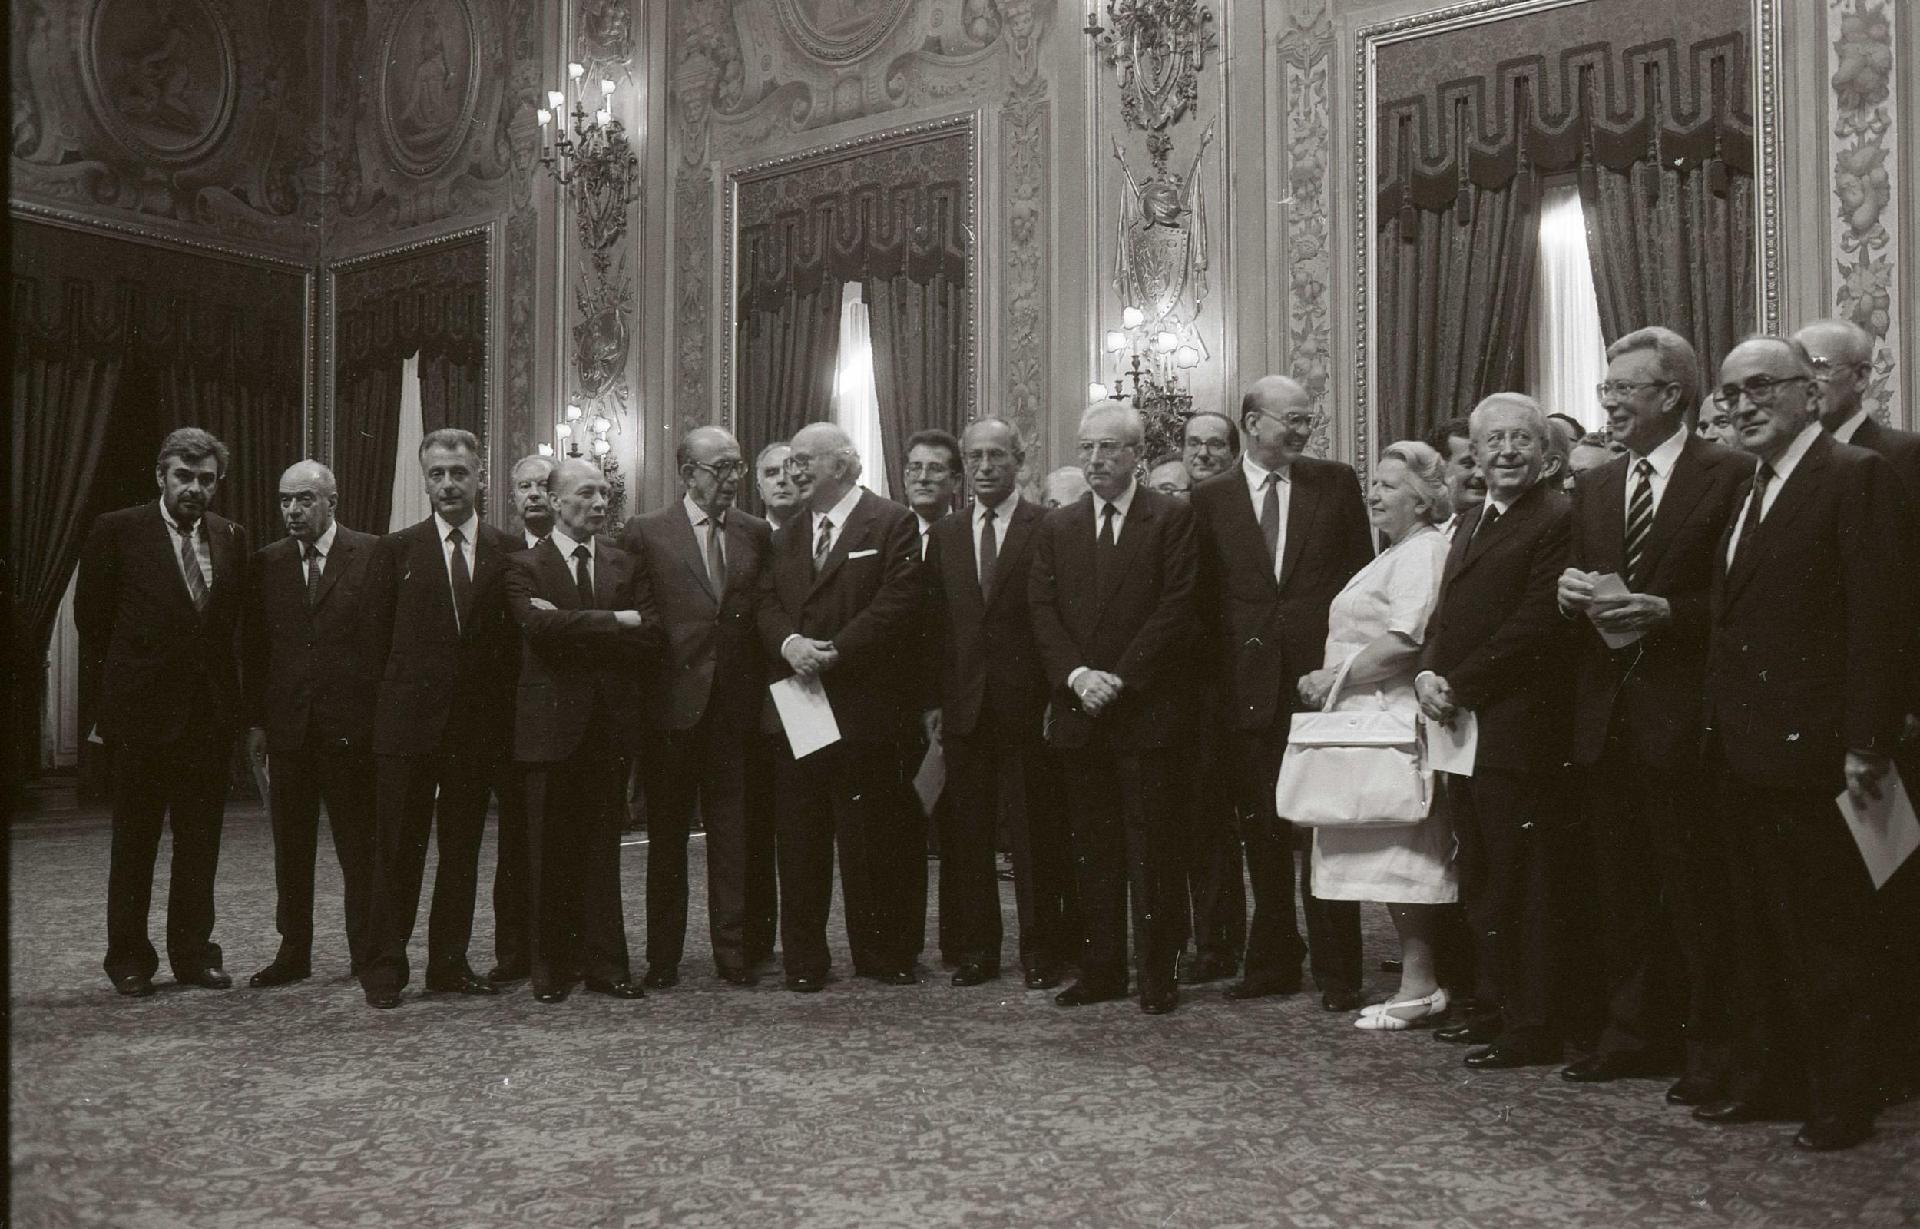 II Governo Craxi, 1° agosto 1986